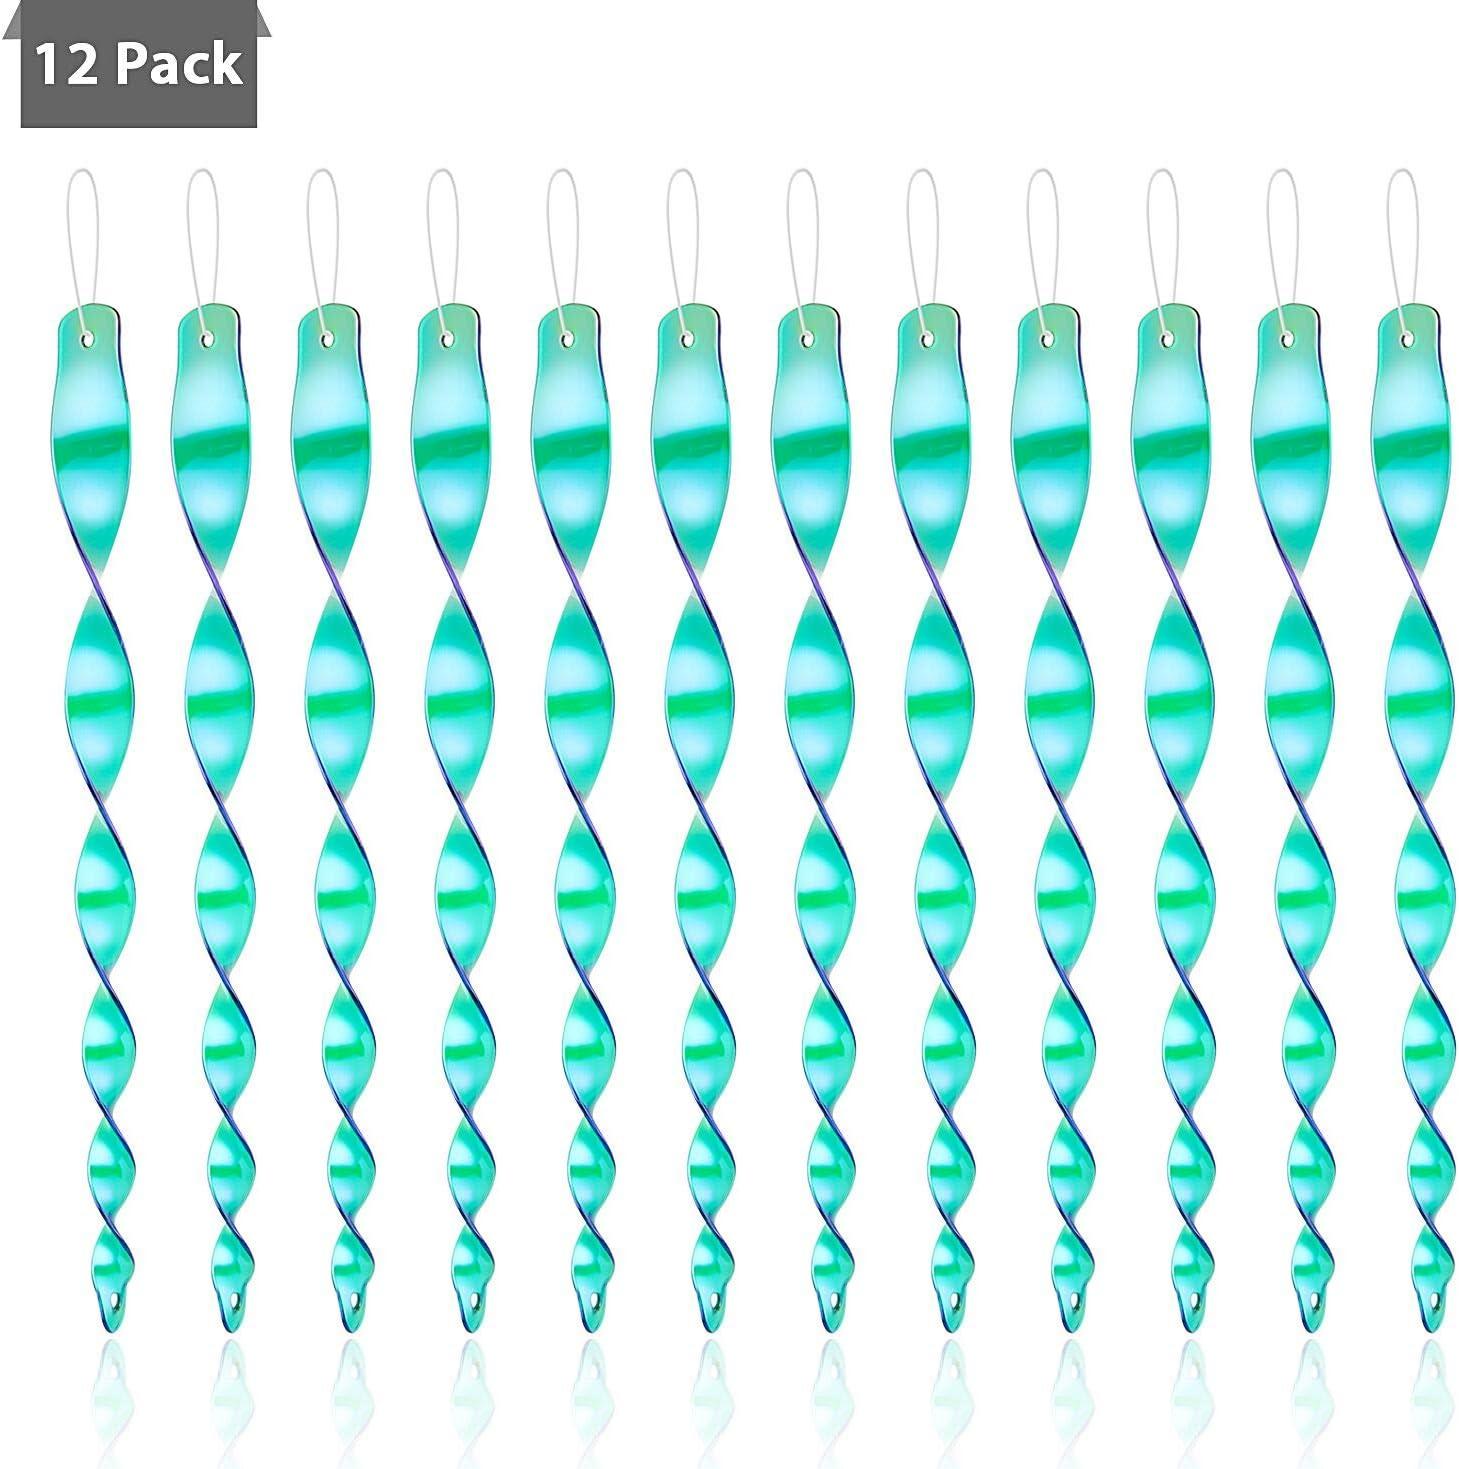 Colmanda Reflectantes Wind Espiral, 12 Piezas Ahuyentador de Pájaros Repelente de Aves 30cm Espiral de Viento Reflectante para Decoración de Jardín Hogar (3)